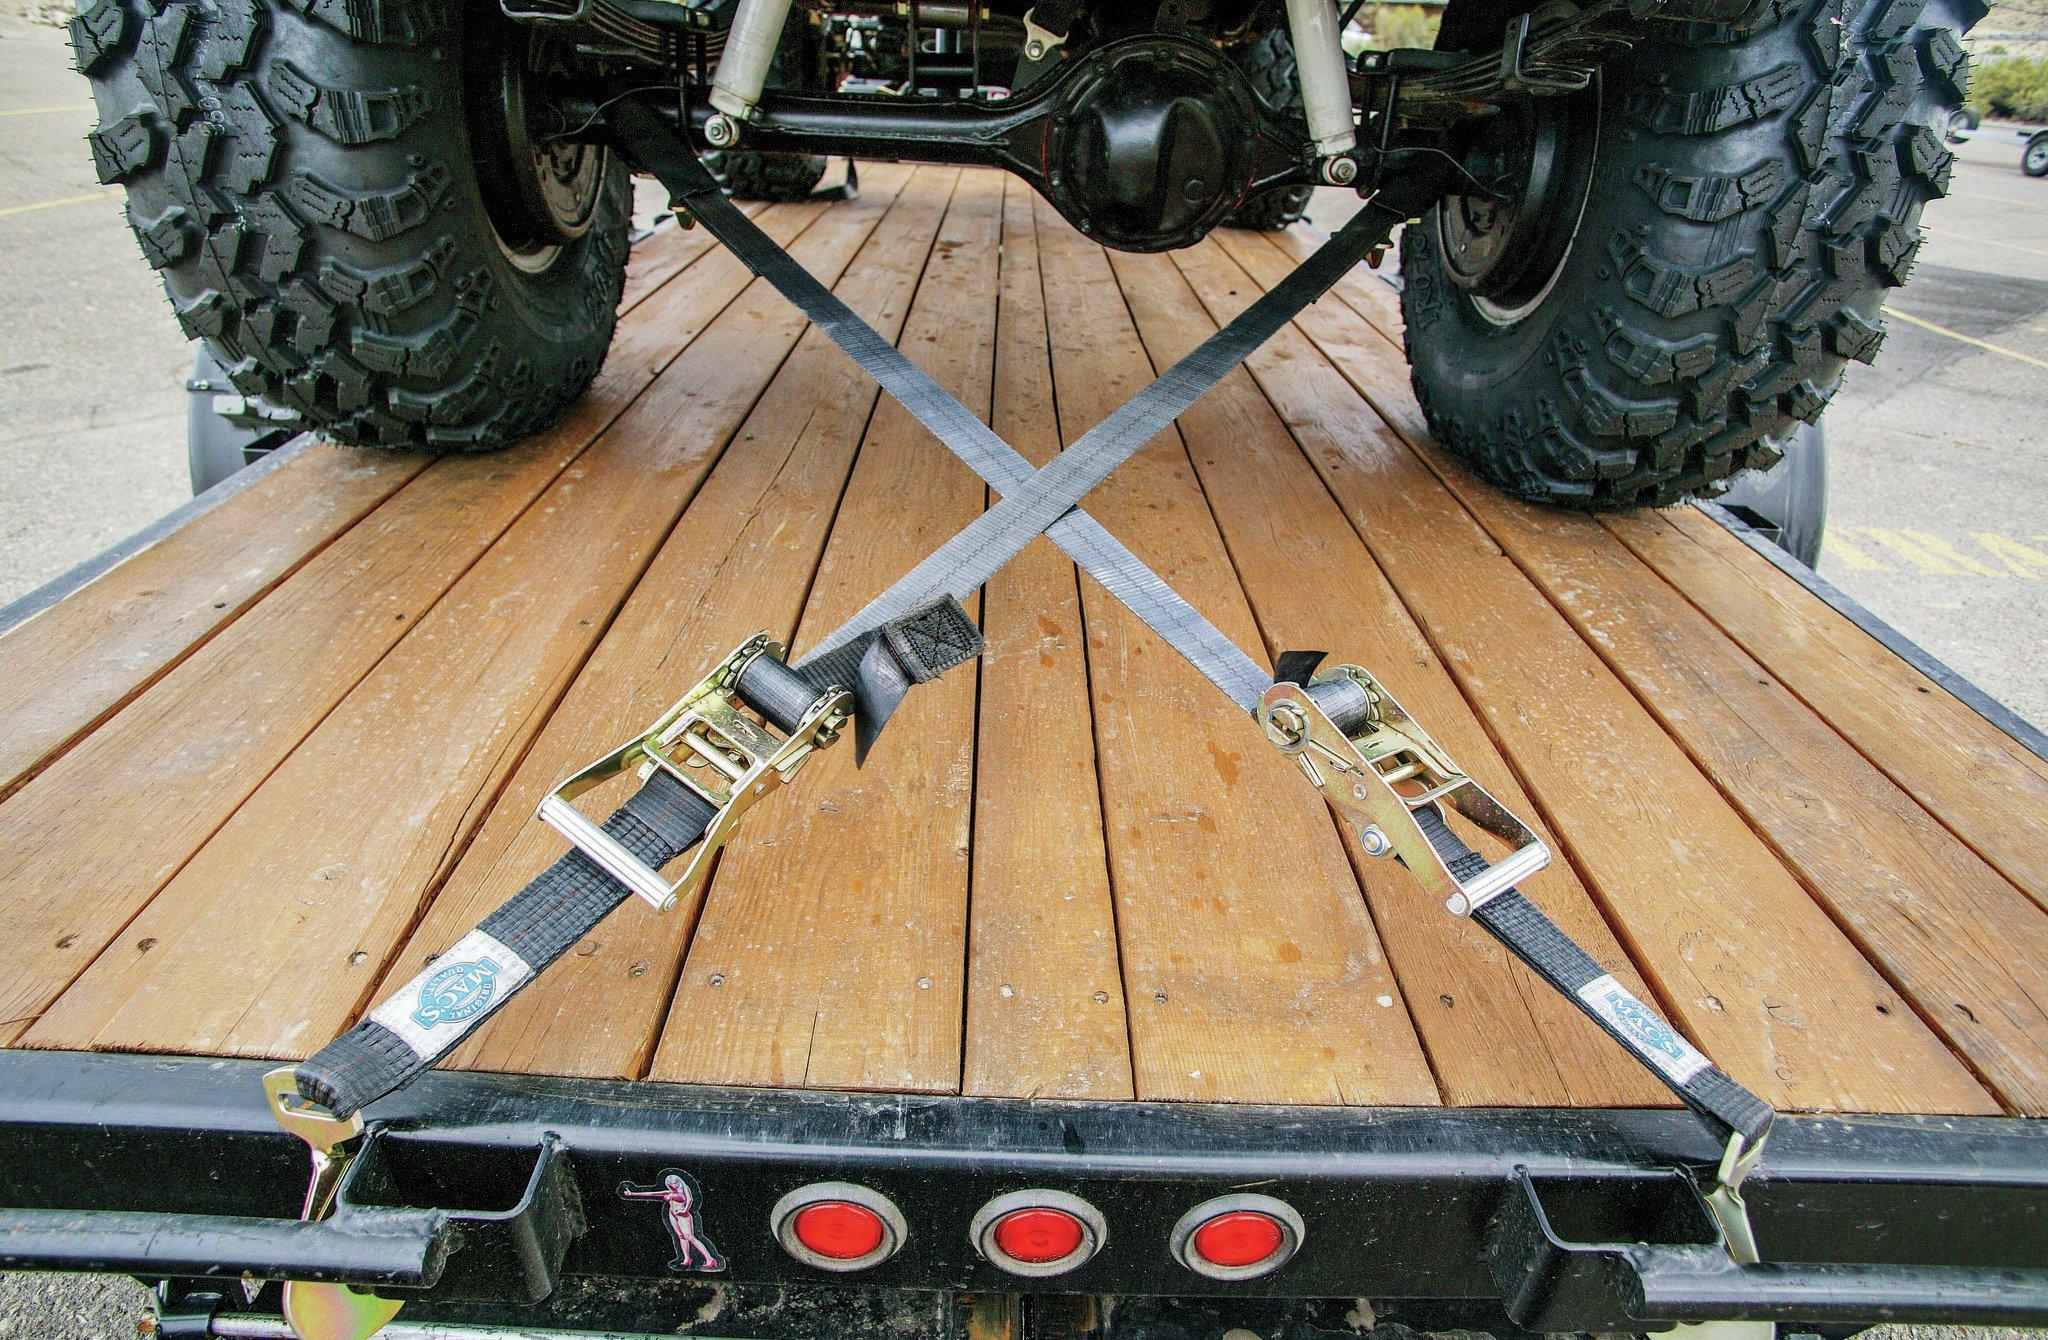 trailer straps in x pattern